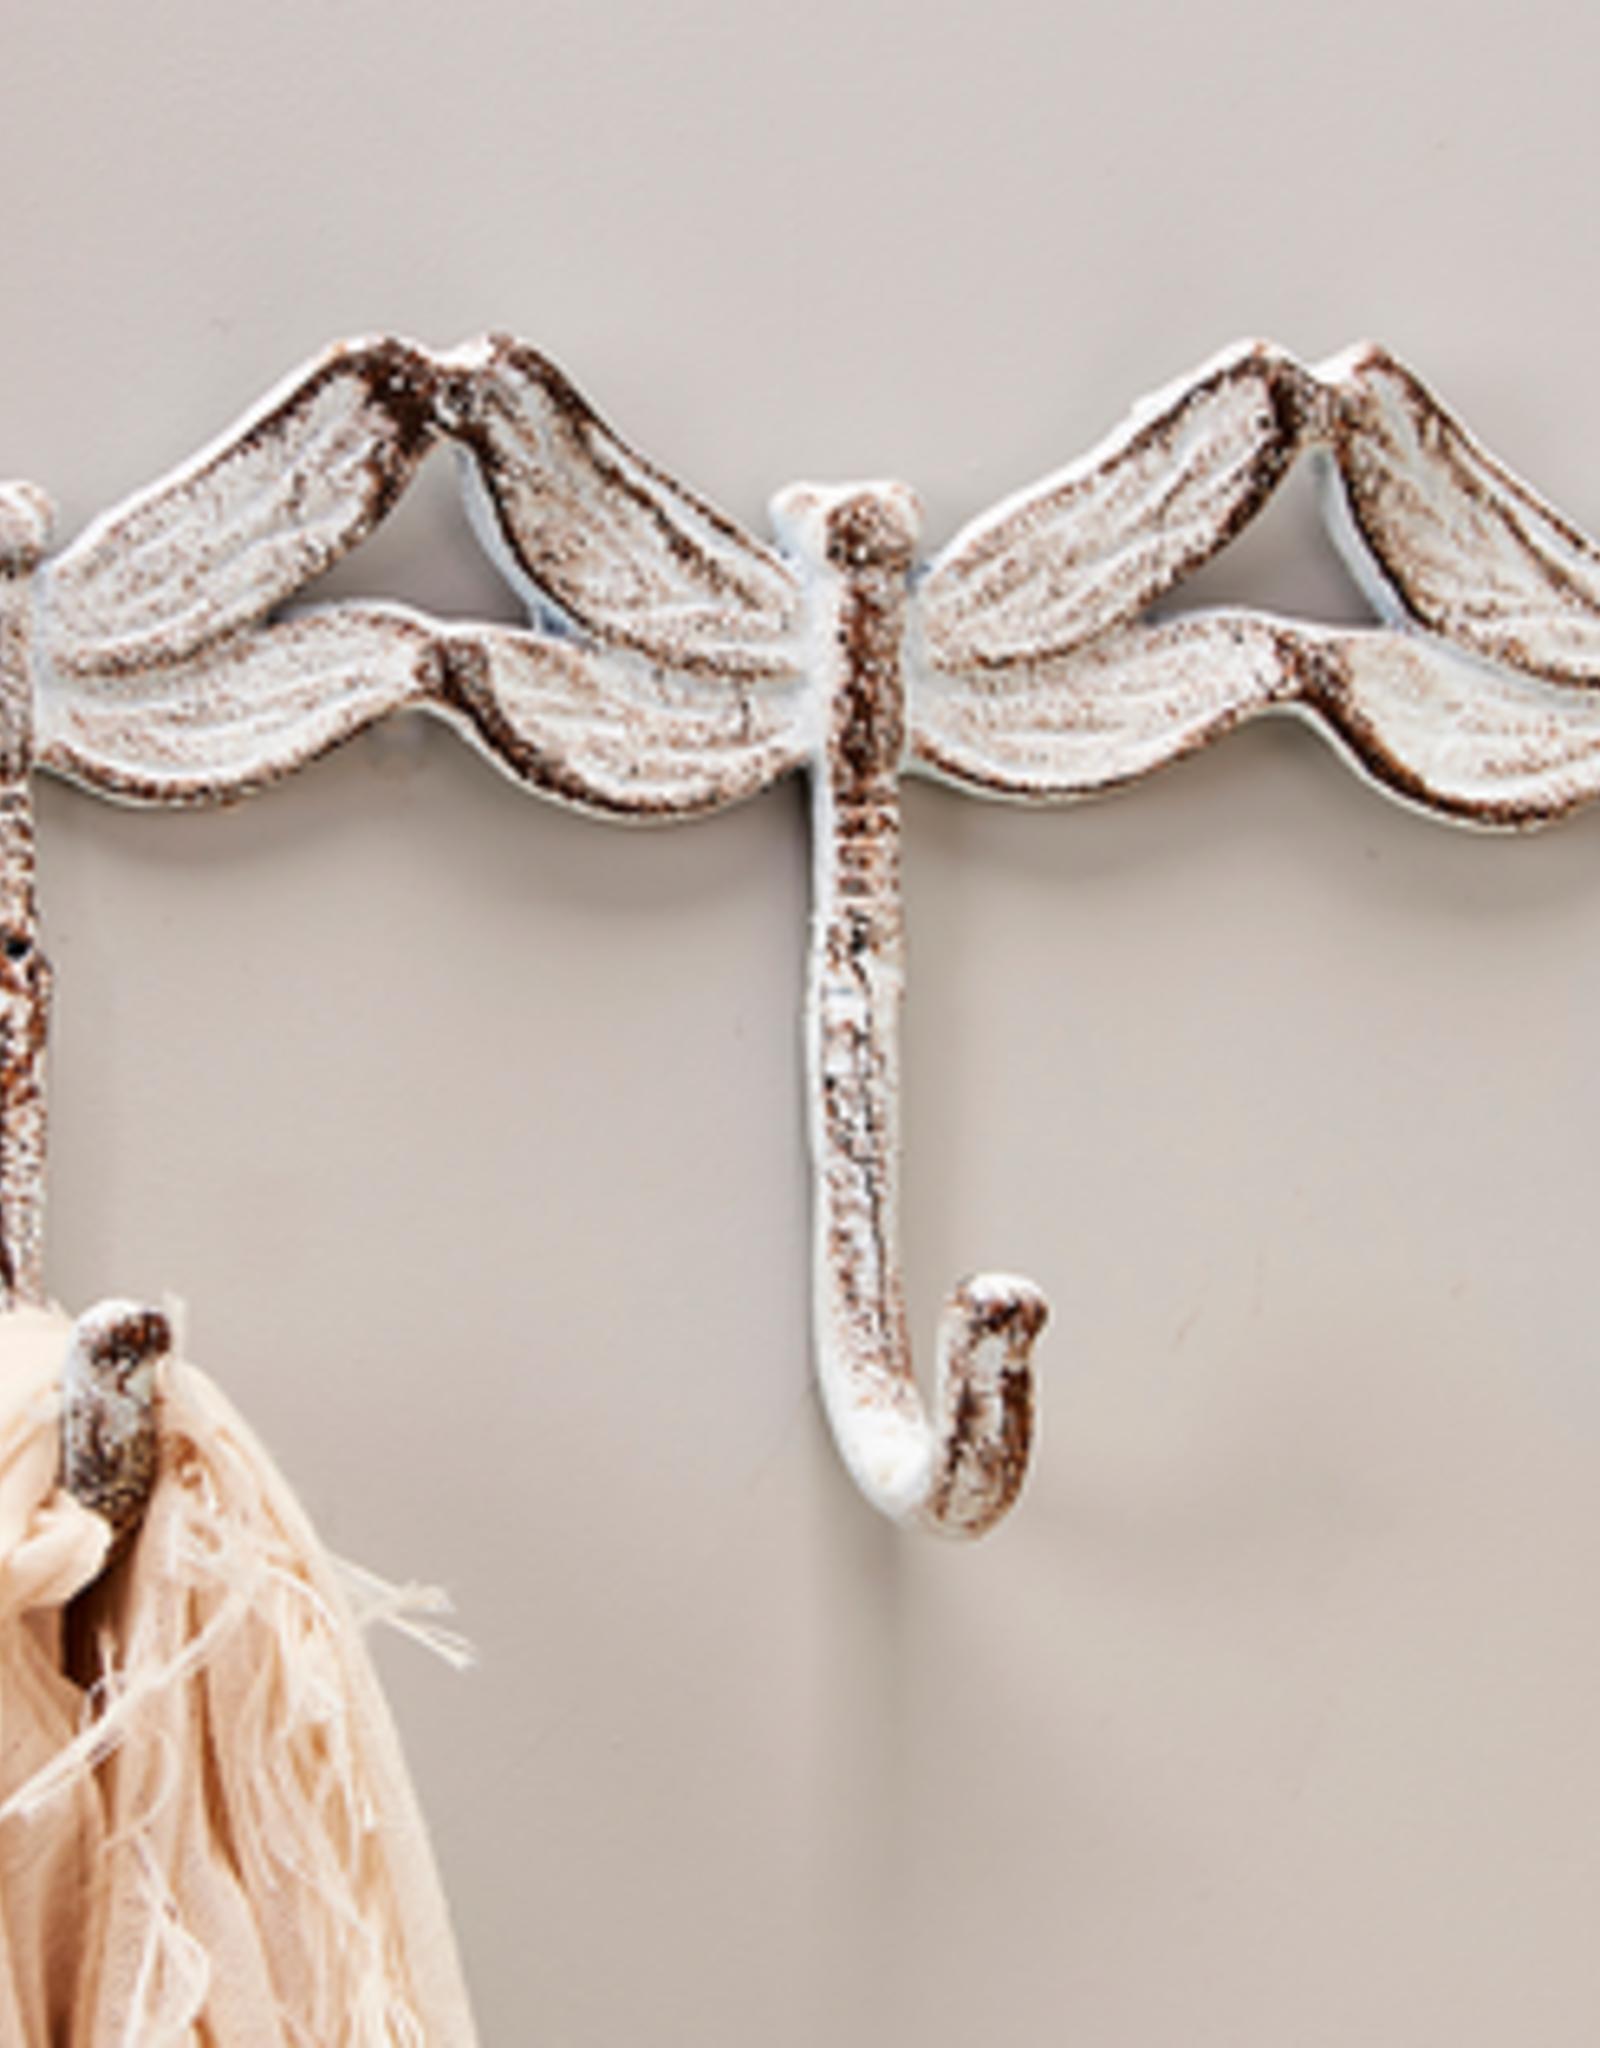 Dragonfly Design Wall Decor w/3 Hooks